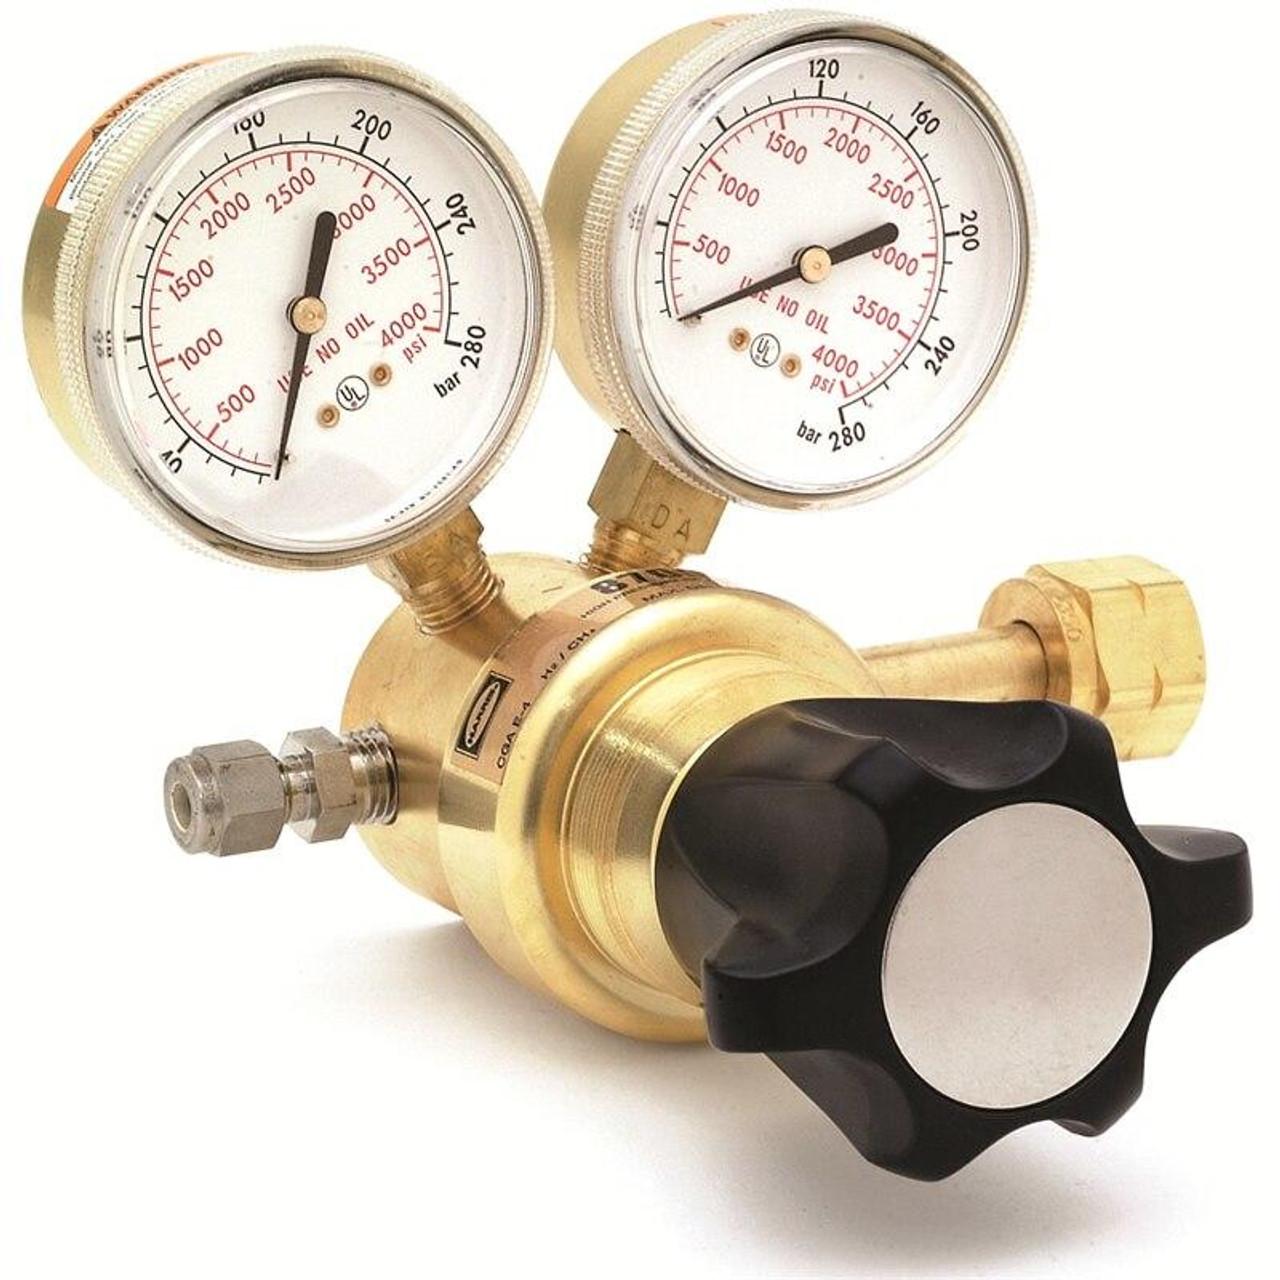 Harris Model 8700-4500-347 Medical Air Ultra High Delivery Pressure Regulator - 3200315